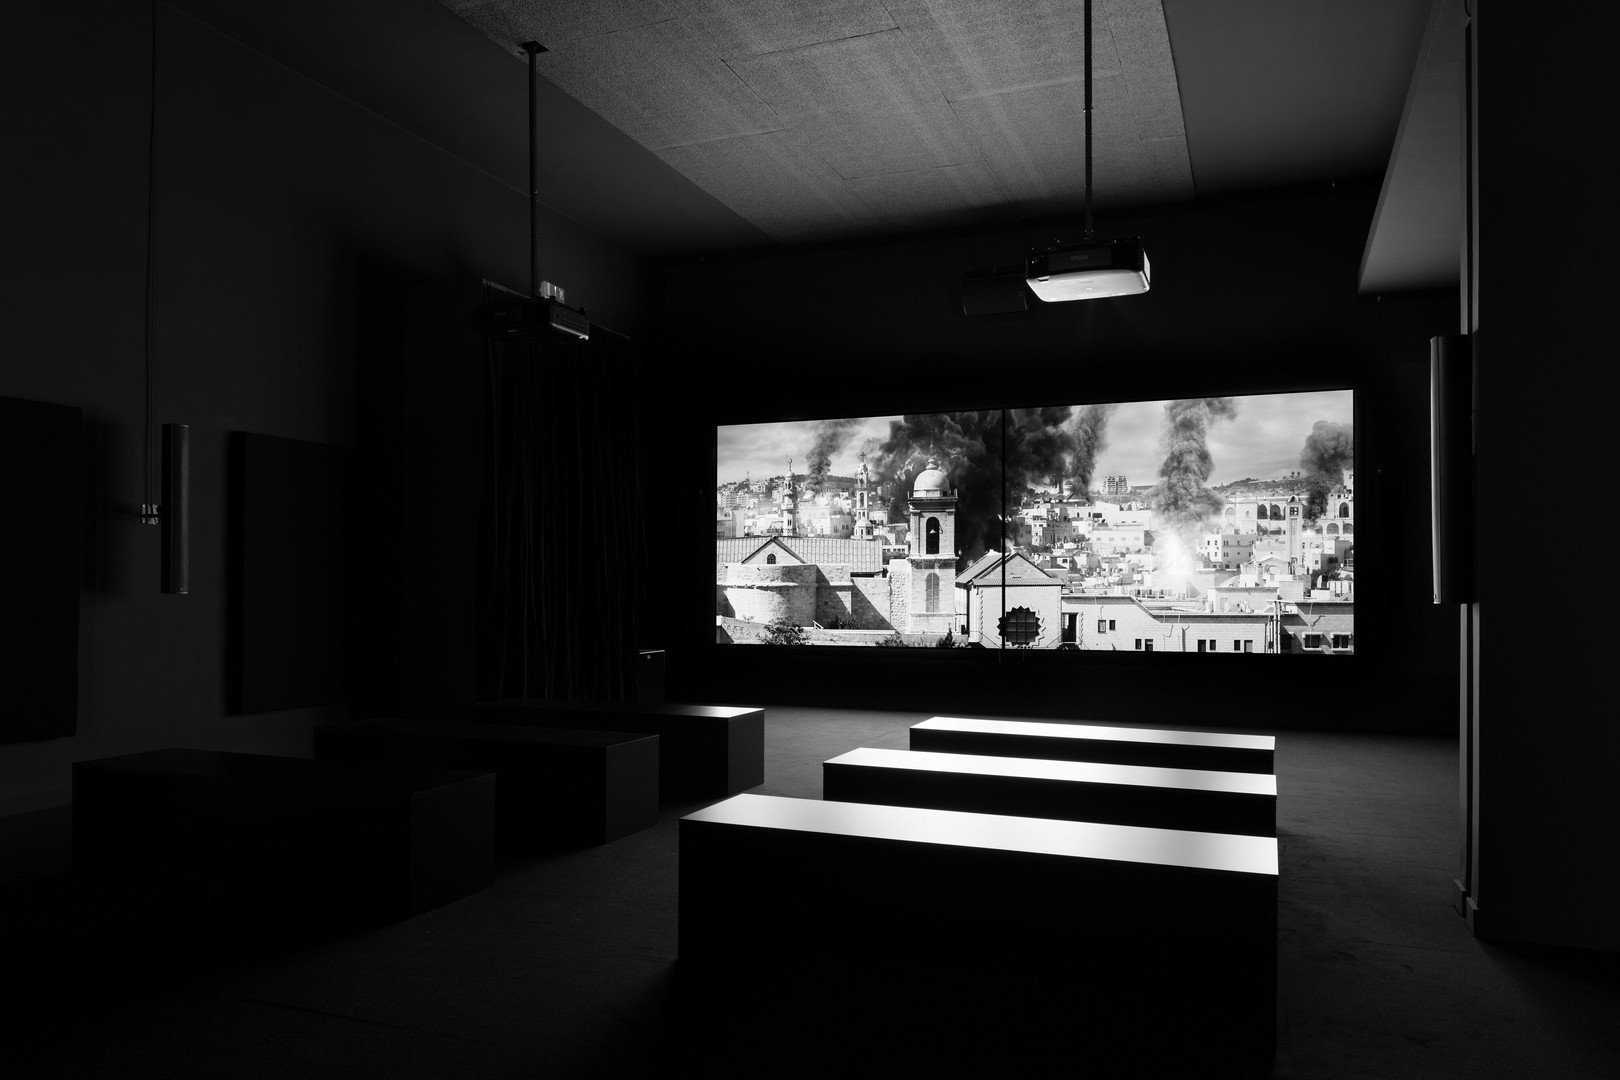 Larissa Sansour and Søren Lind.Installation view of In Vitro, 2-channelblack and white film. 27 mins 44 secs,2019. Photo by Ugo Carmeni.